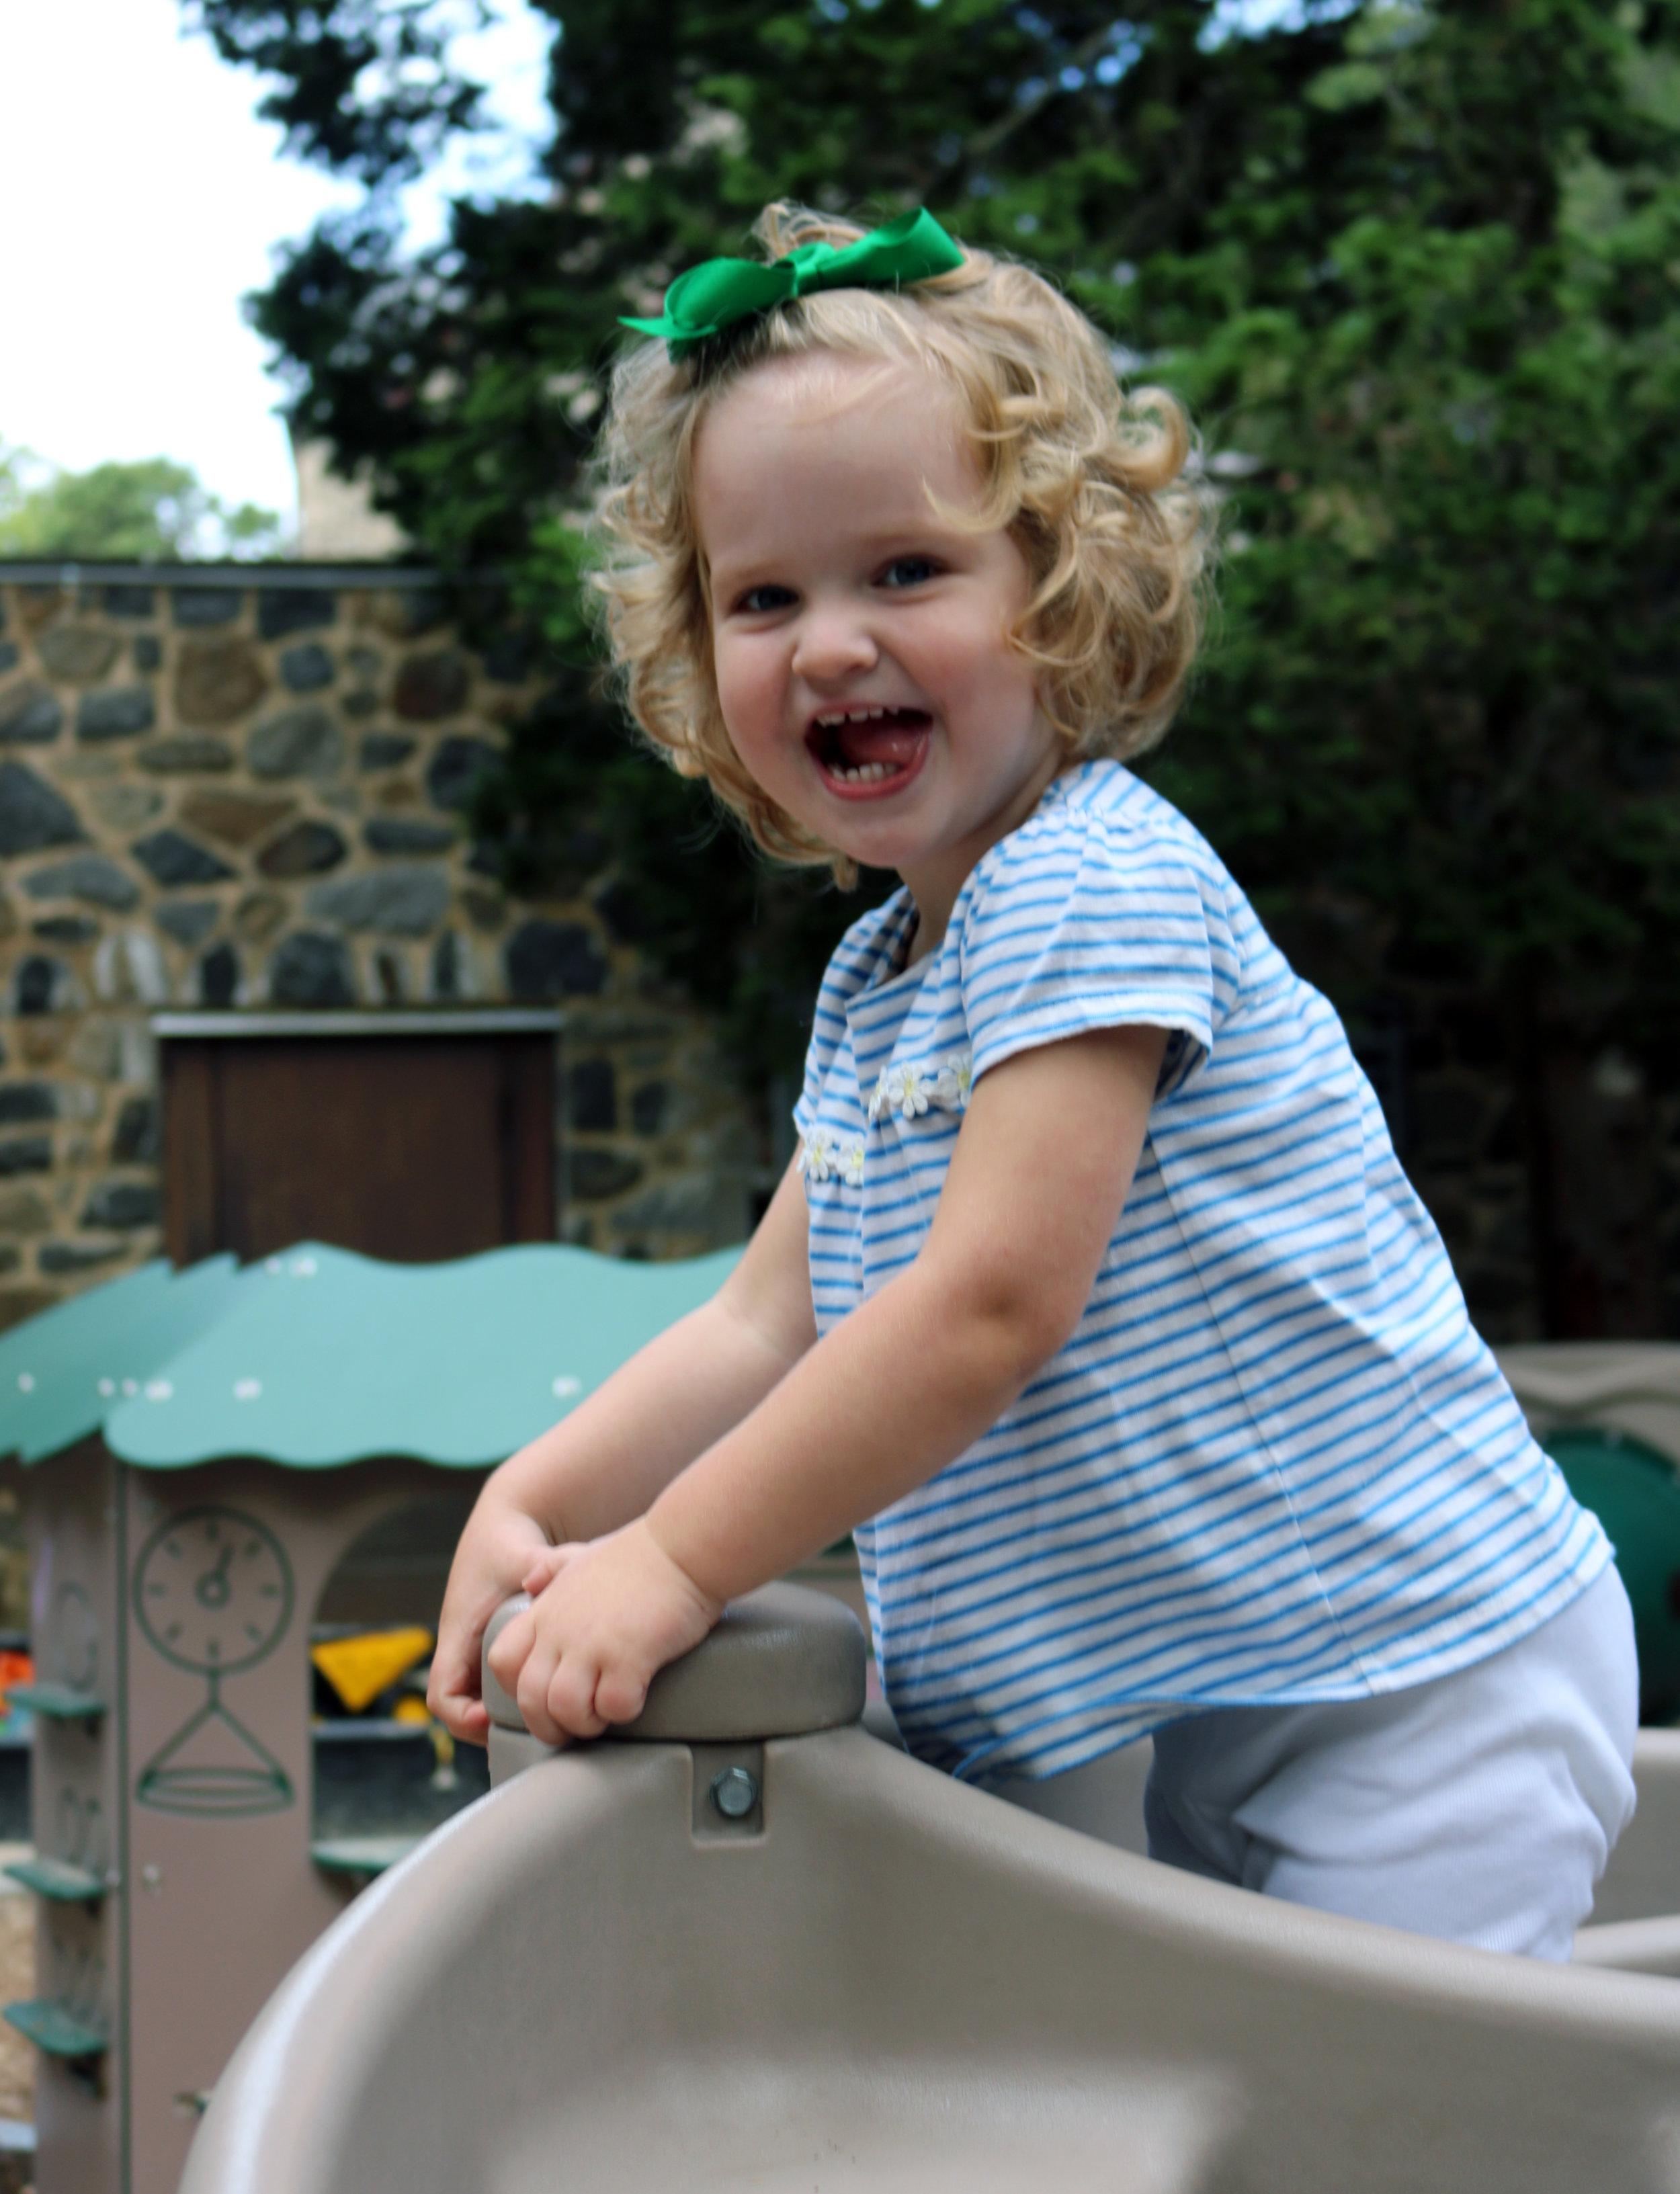 Joyful toddler girl climbing on playground equipment